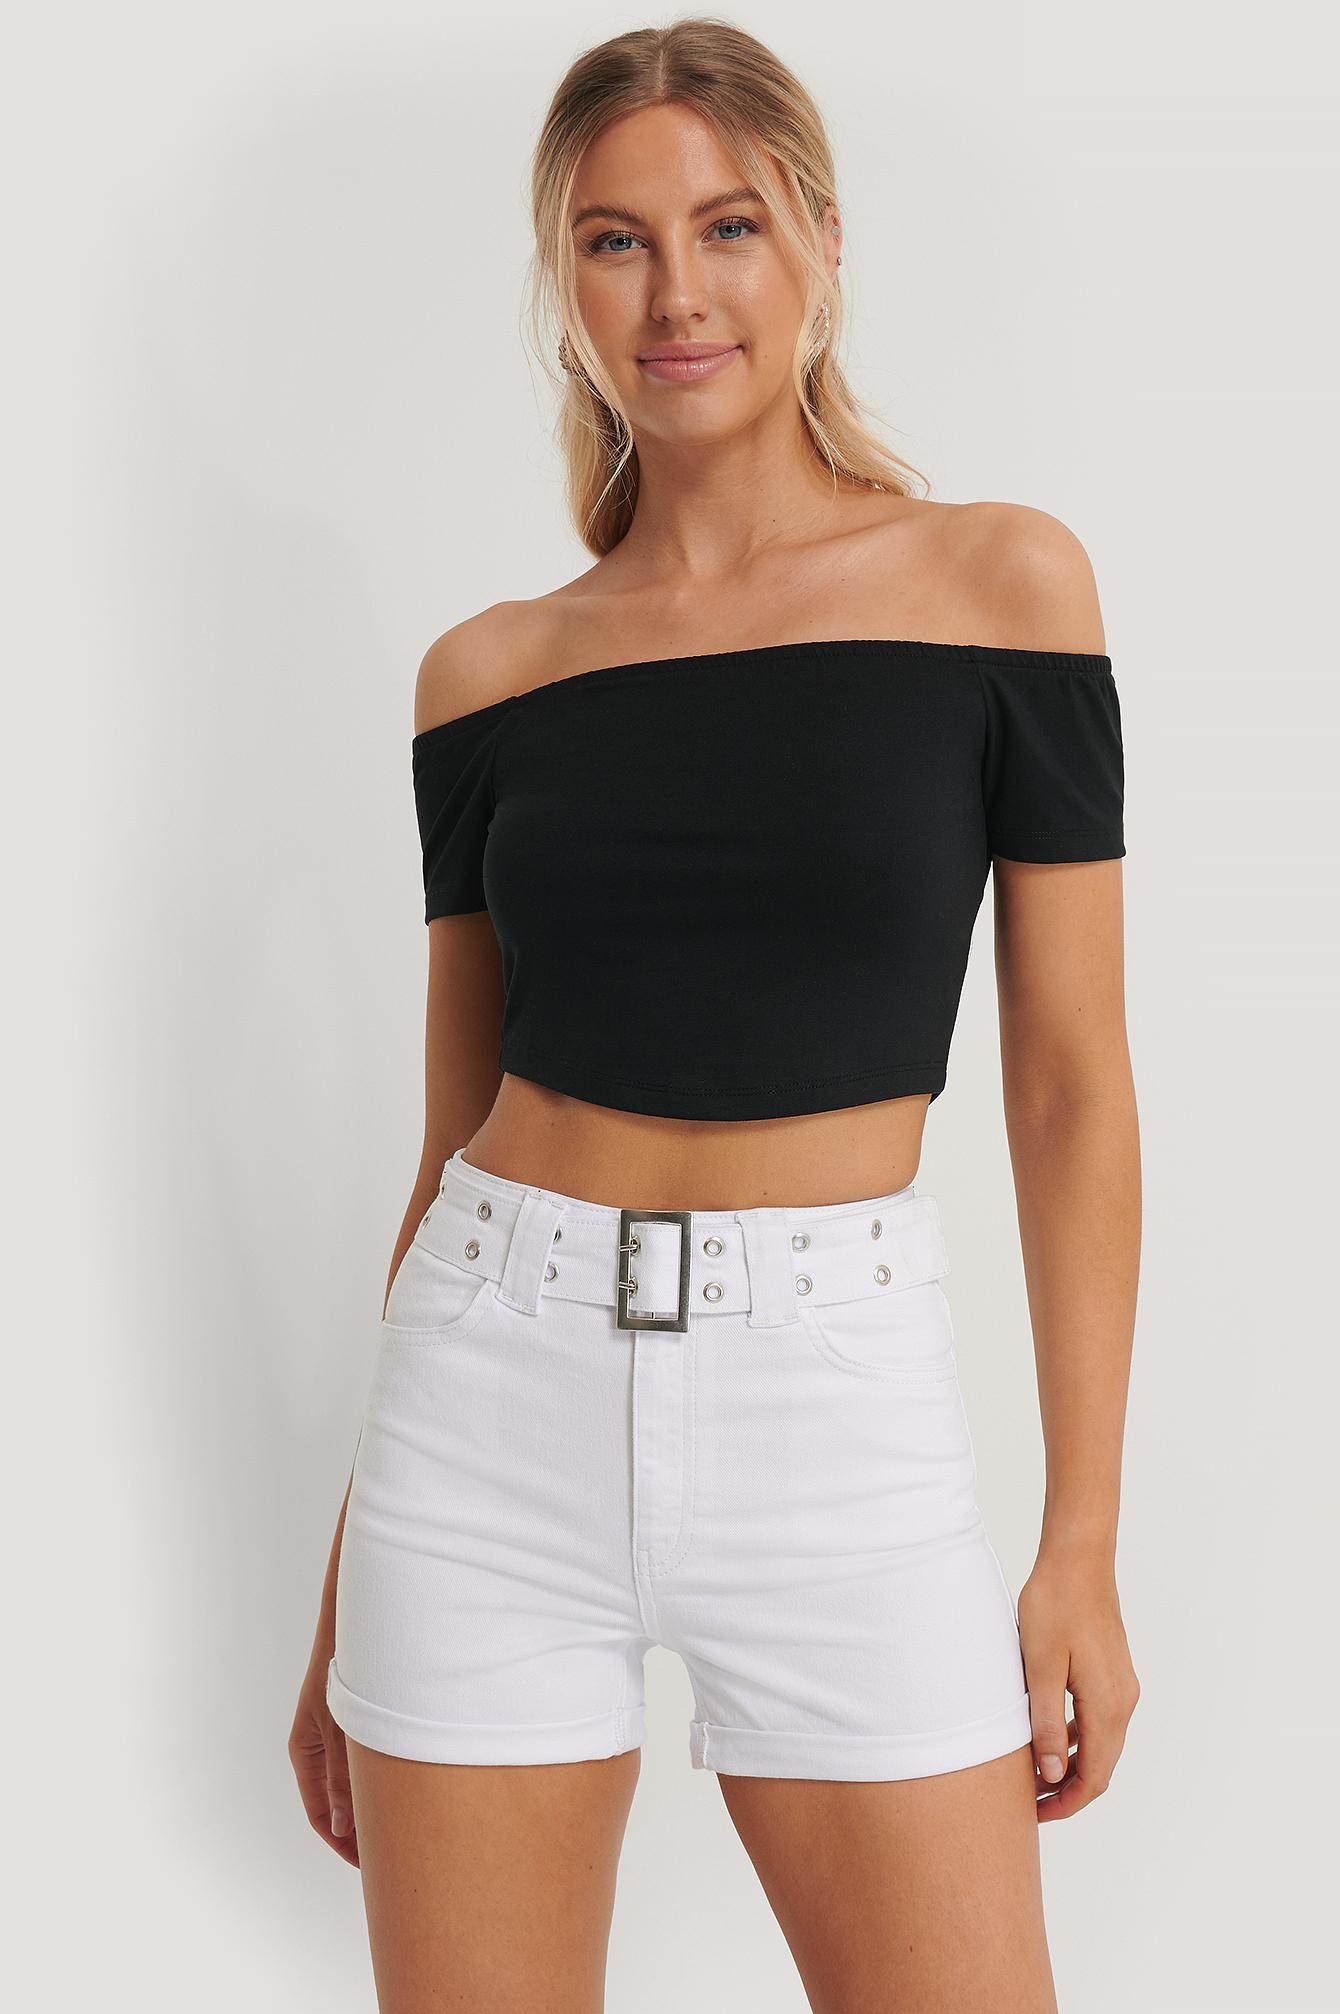 pamela x na-kd reborn -  Organisch Jeans-Shorts Mit Gürtel - White